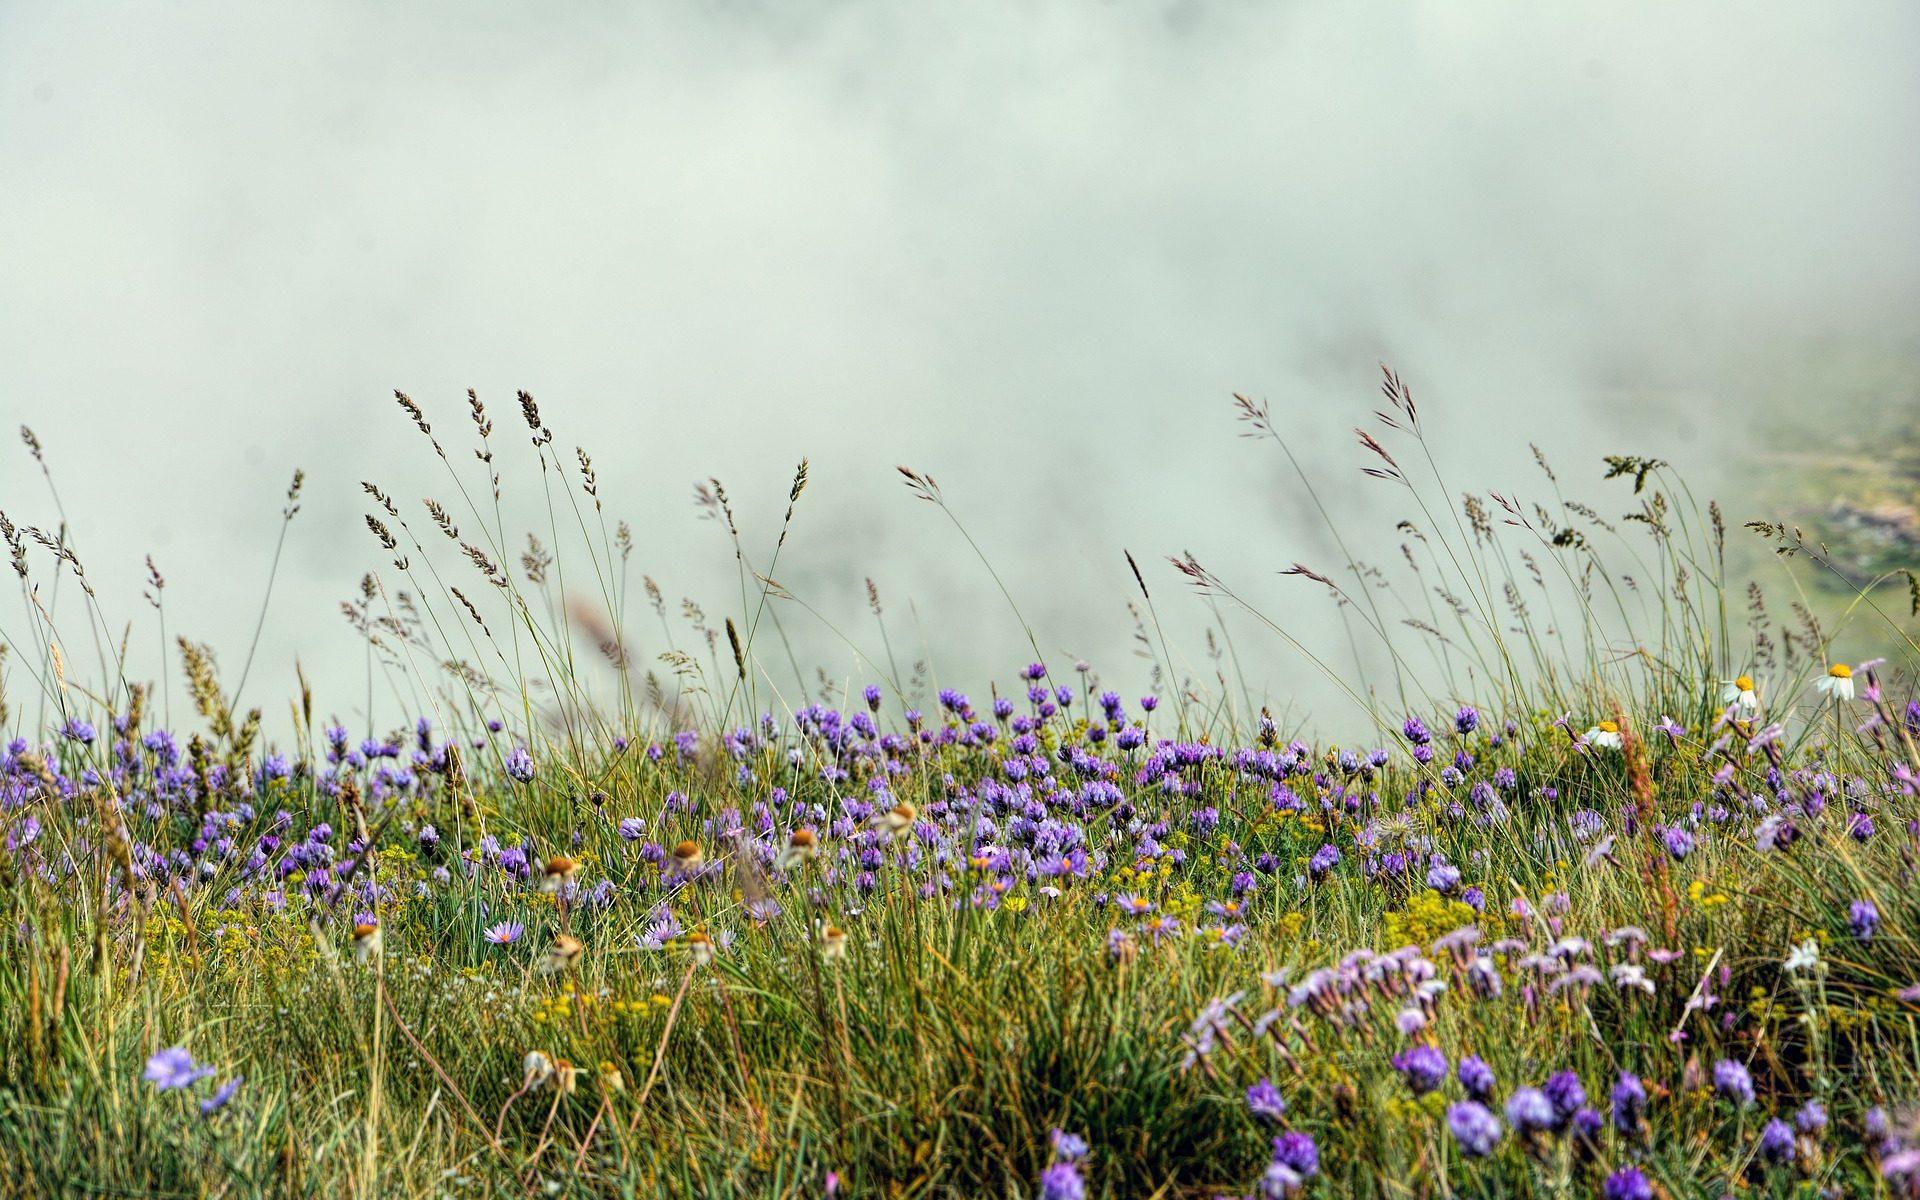 Species-rich grassland mapped during a survey